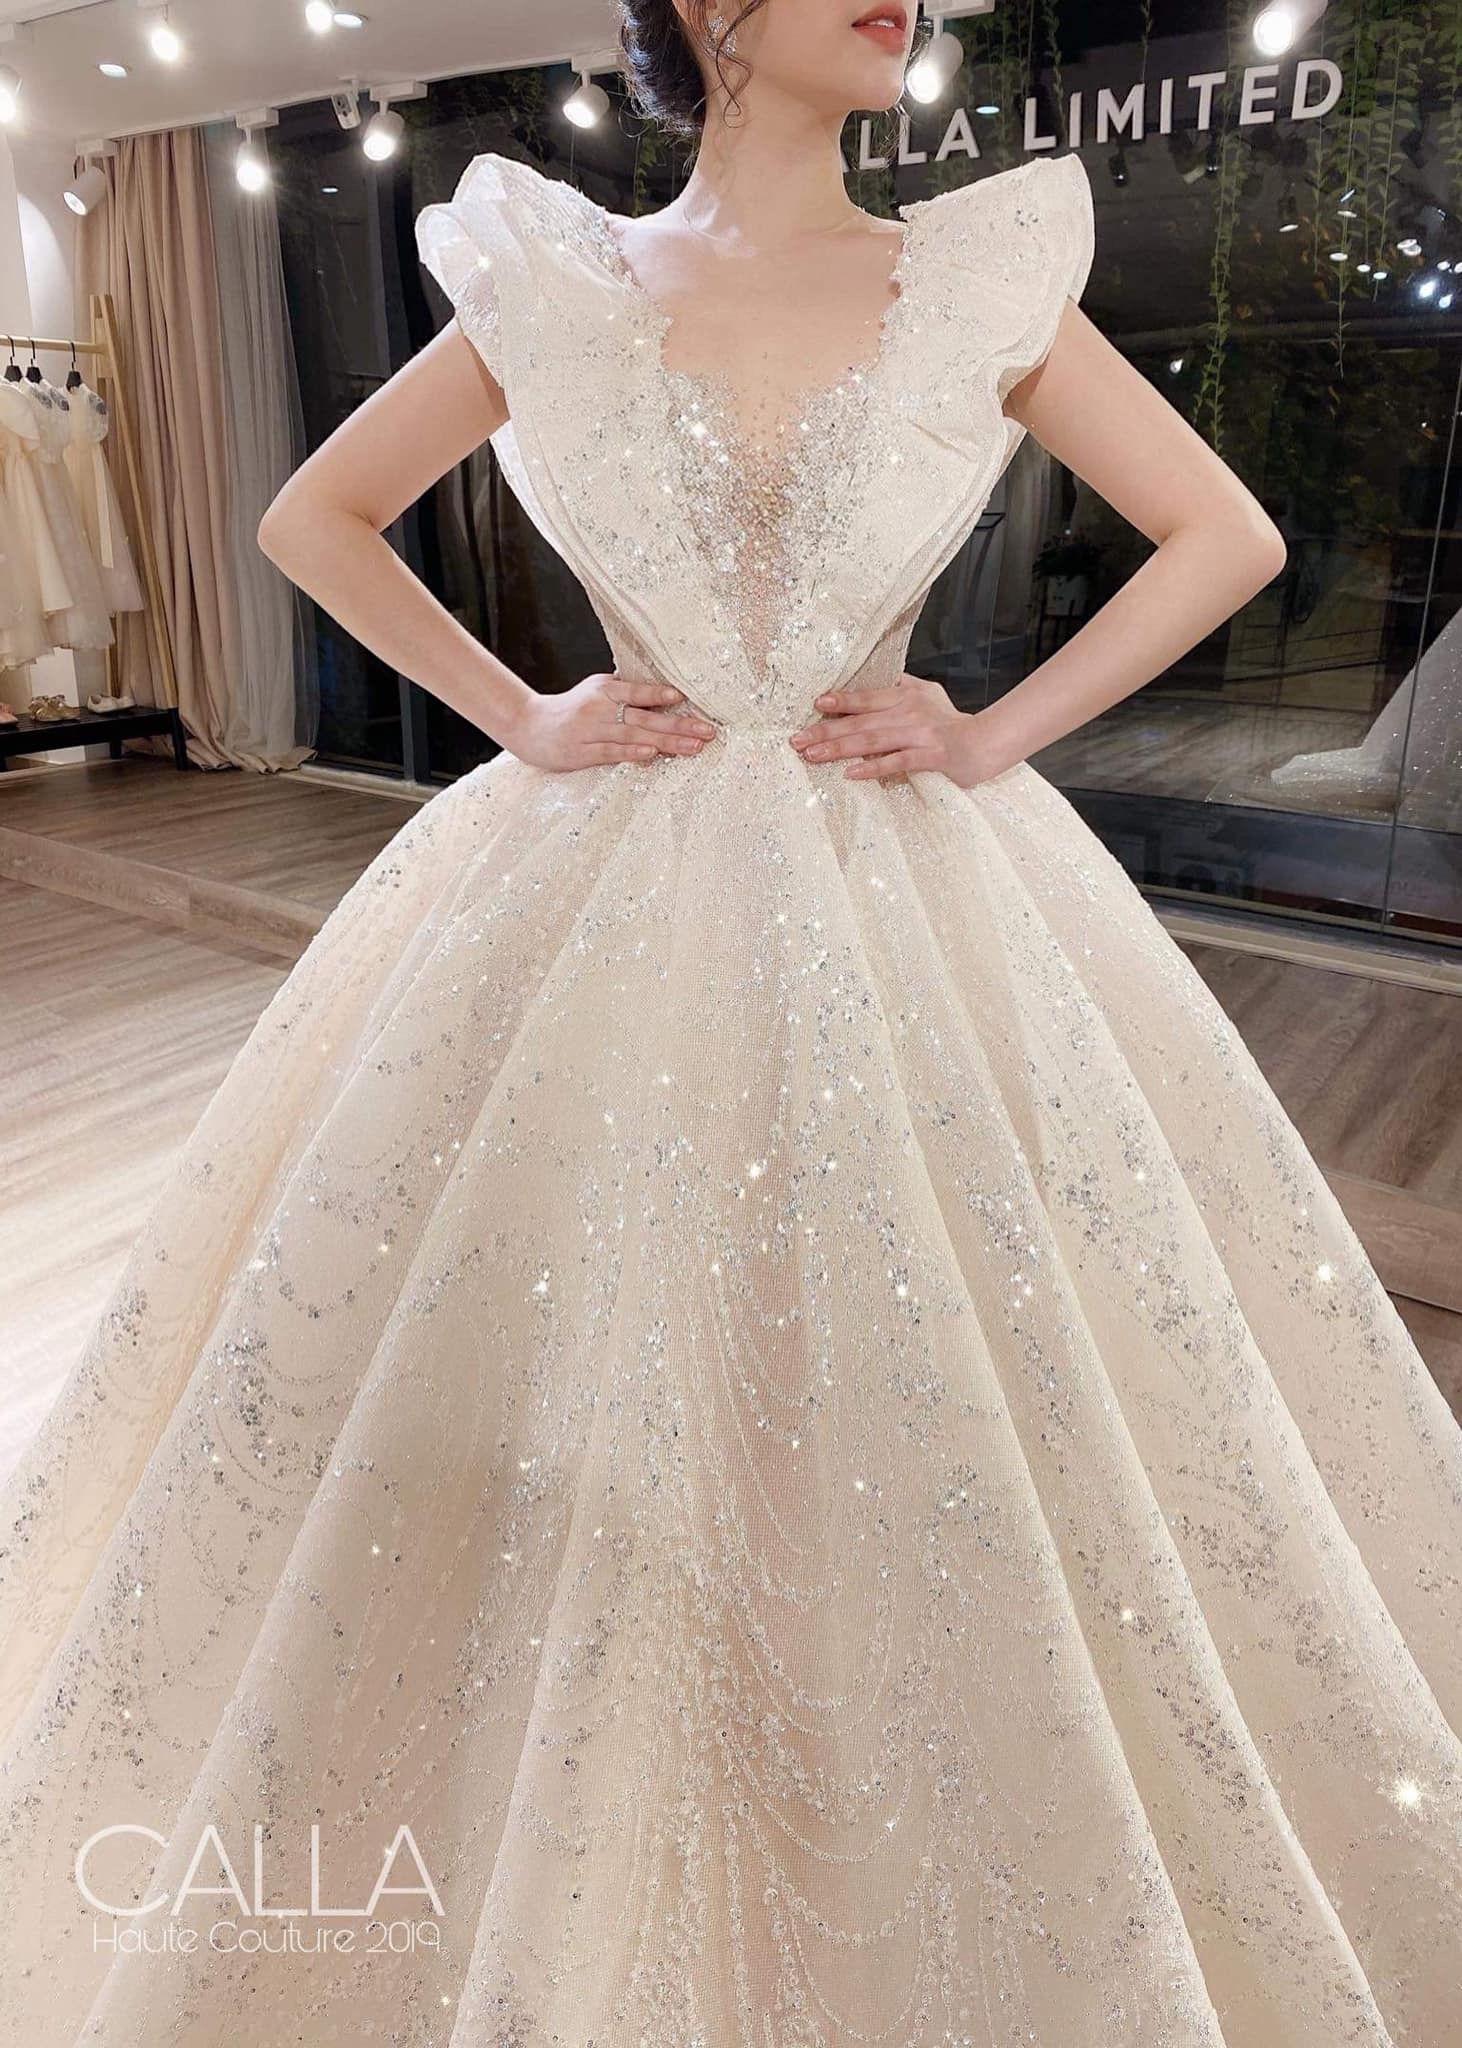 Pin By Ester Linggarwati Gunawan On Fairy Tale Wedding Dress Fancy Wedding Dresses Wedding Lehenga Designs Pretty Dresses